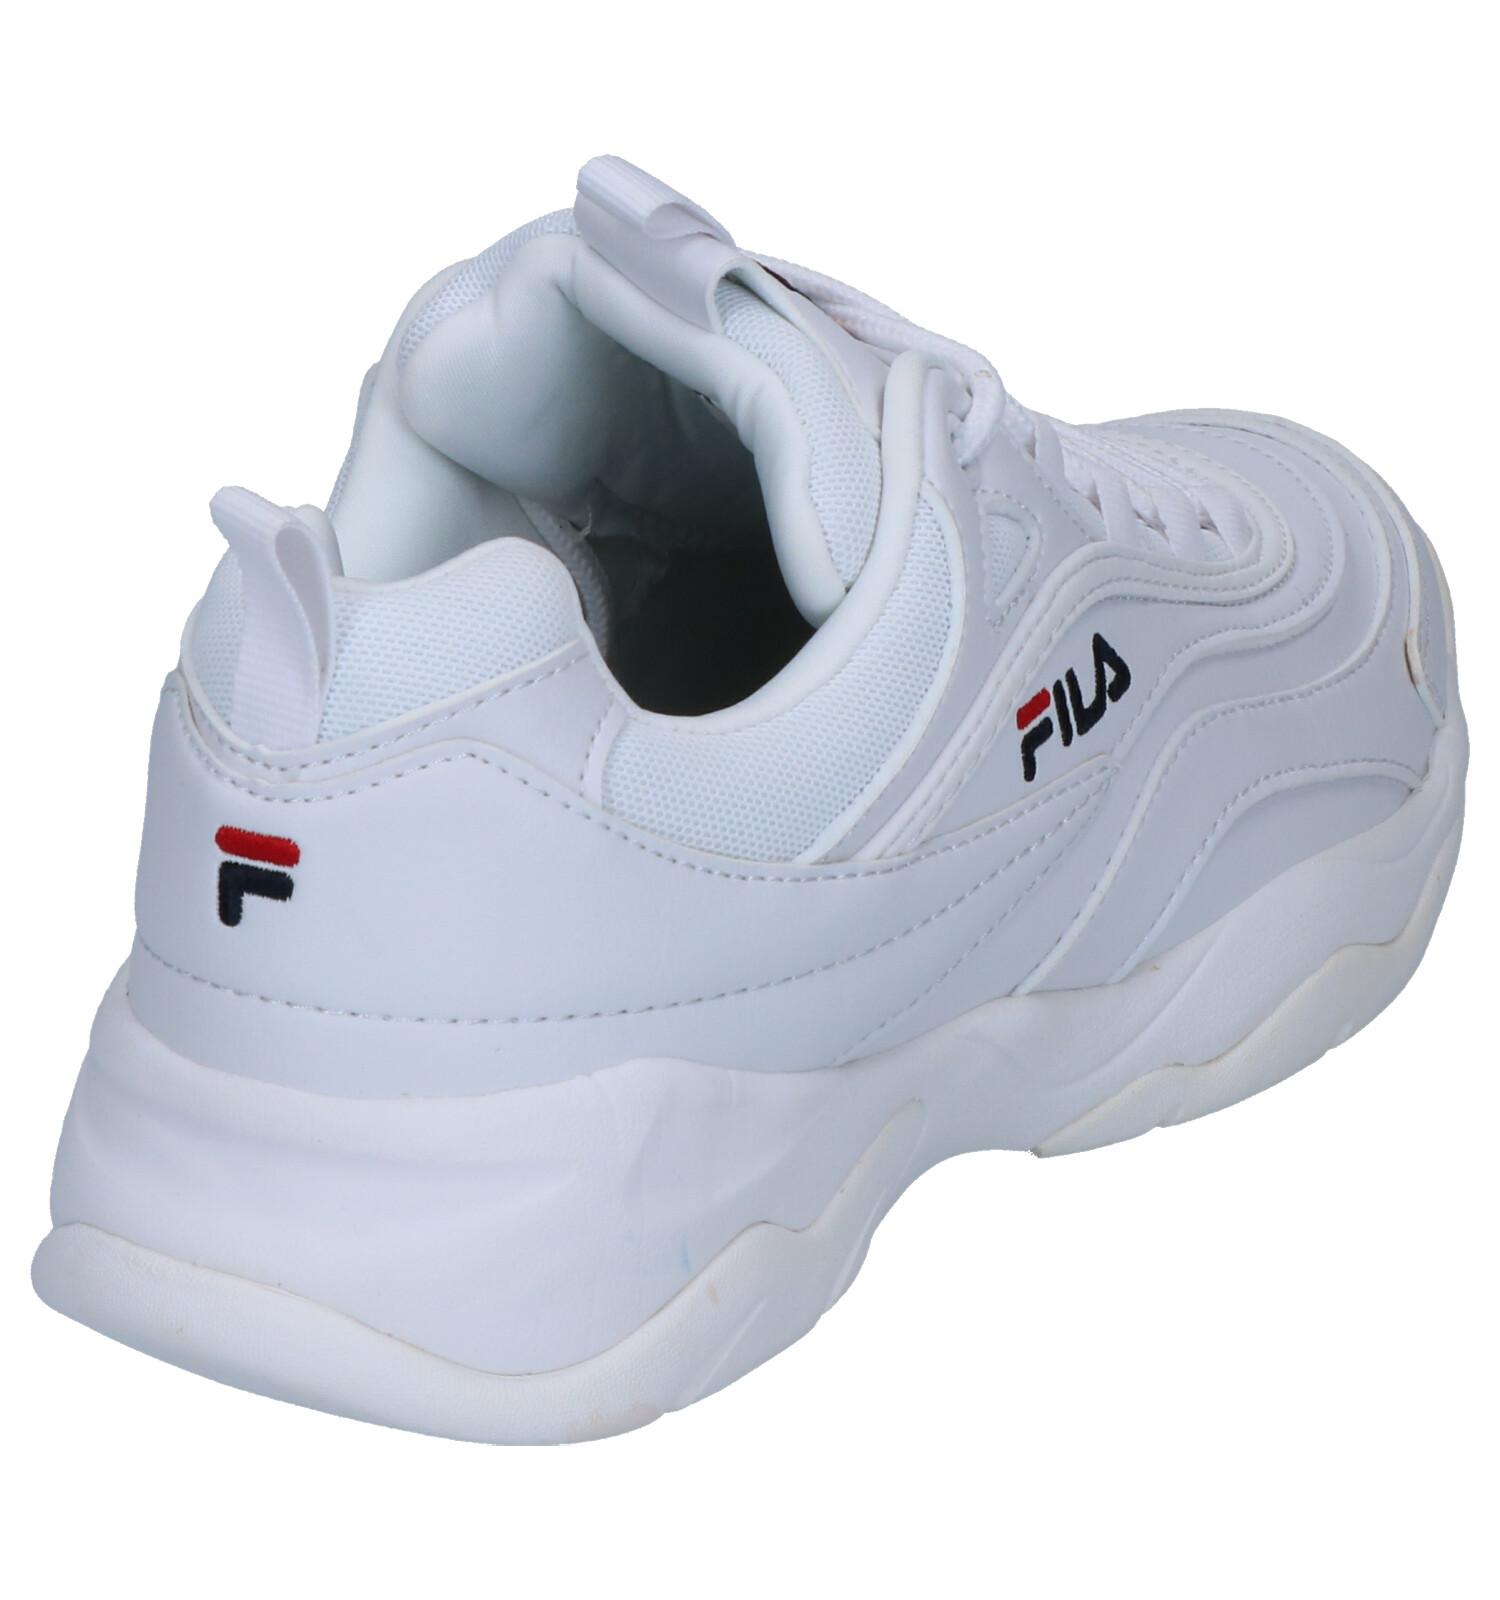 Sneakers Fila Fila Ray Witte Ray Fila Witte Sneakers f6bgyY7